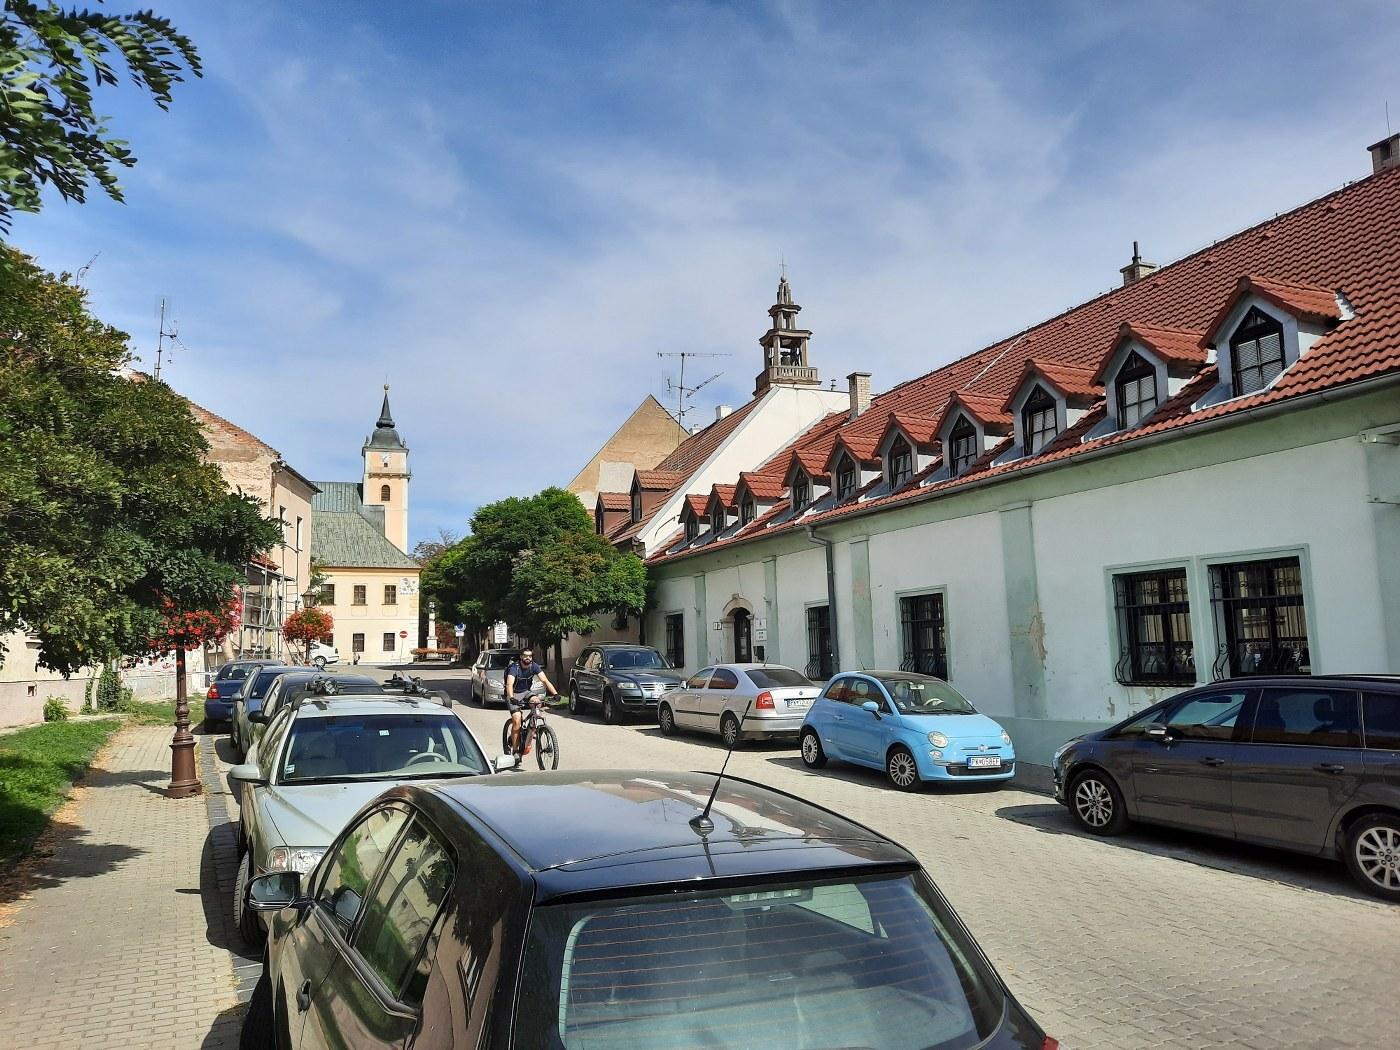 ulice Dr. Kautze